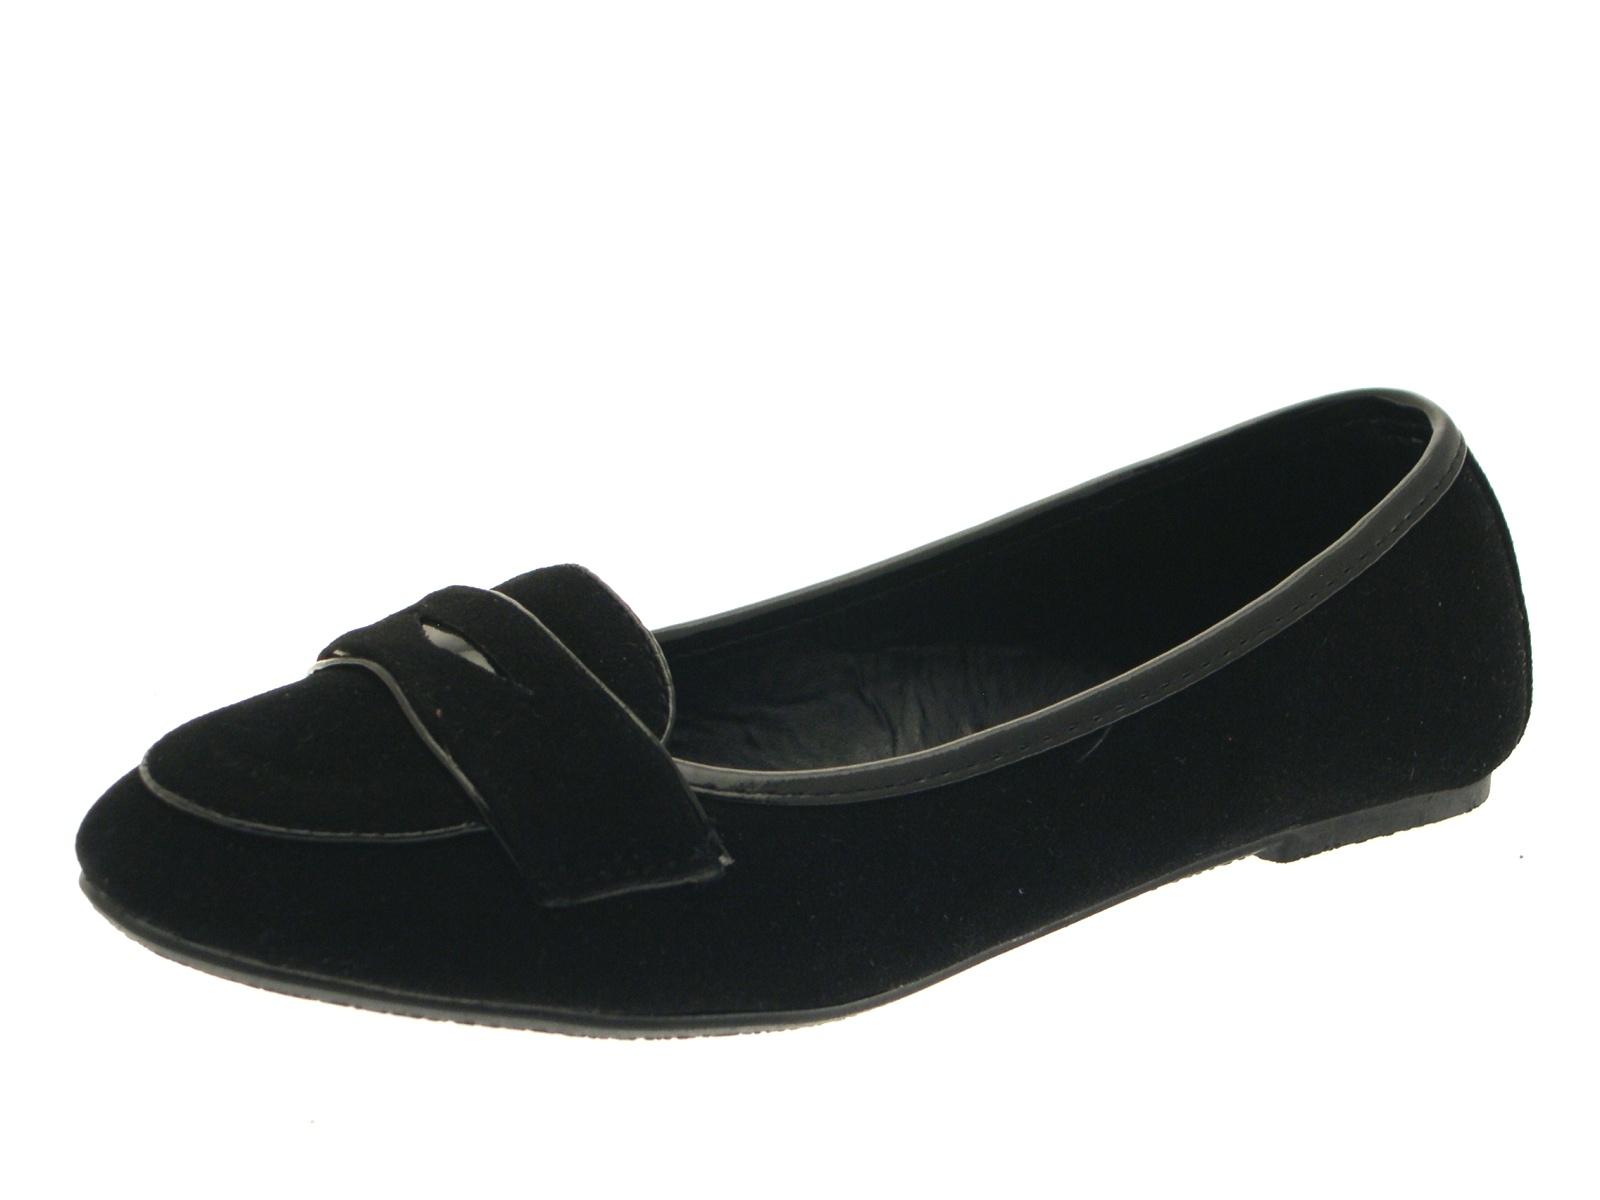 Black Suede Flat Shoes